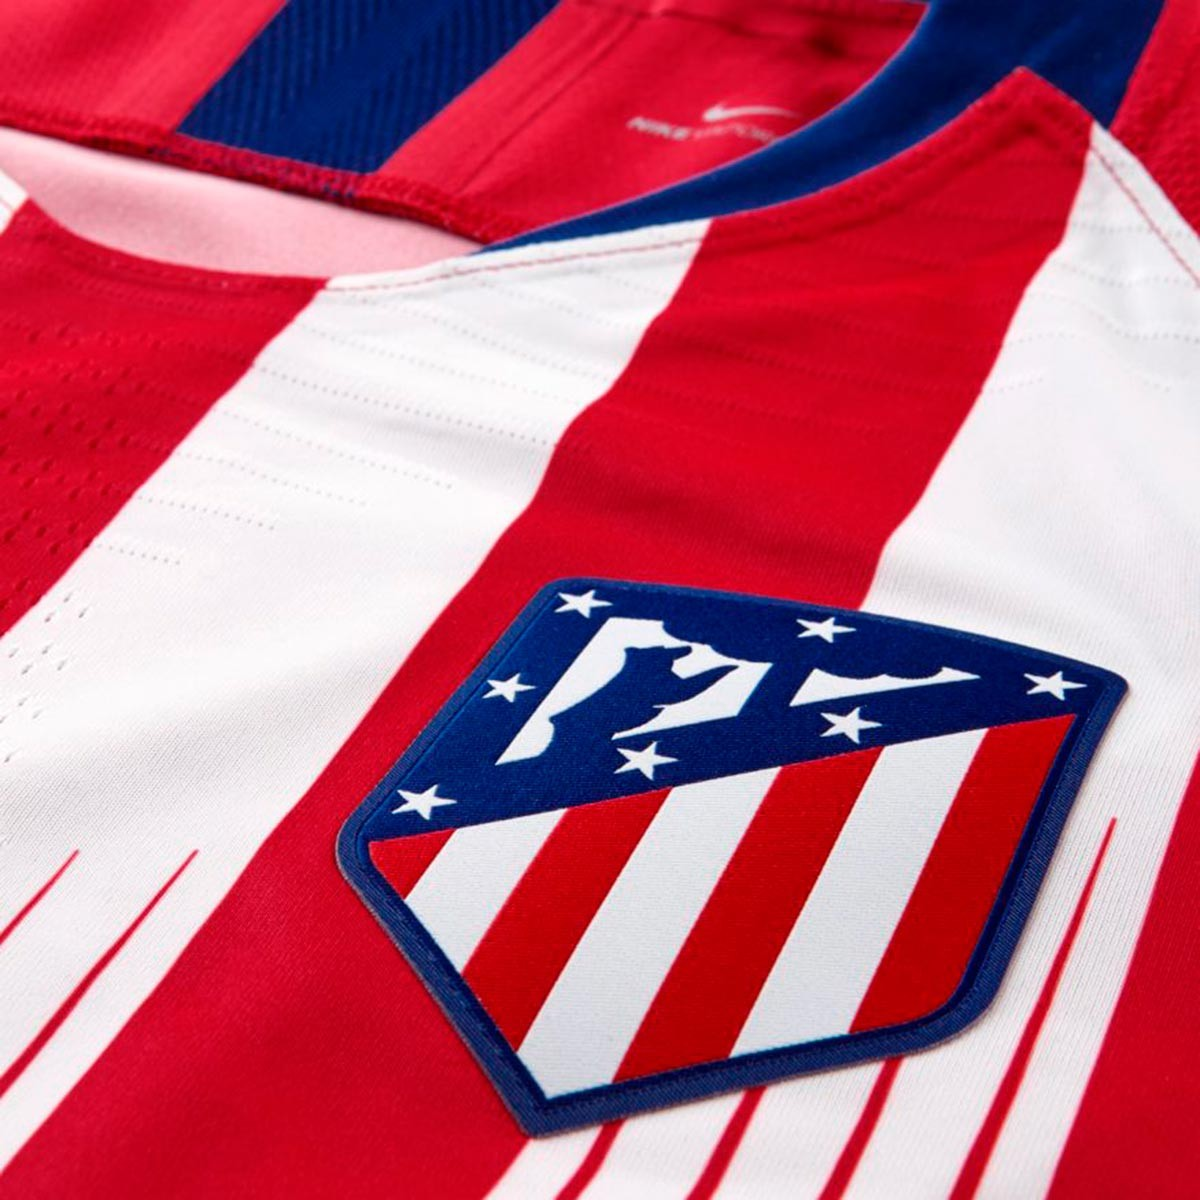 c52537657 Jersey Nike Atlético de Madrid Vapor 2018-2019 Home Sport red-White-Deep  royal blue - Tienda de fútbol Fútbol Emotion